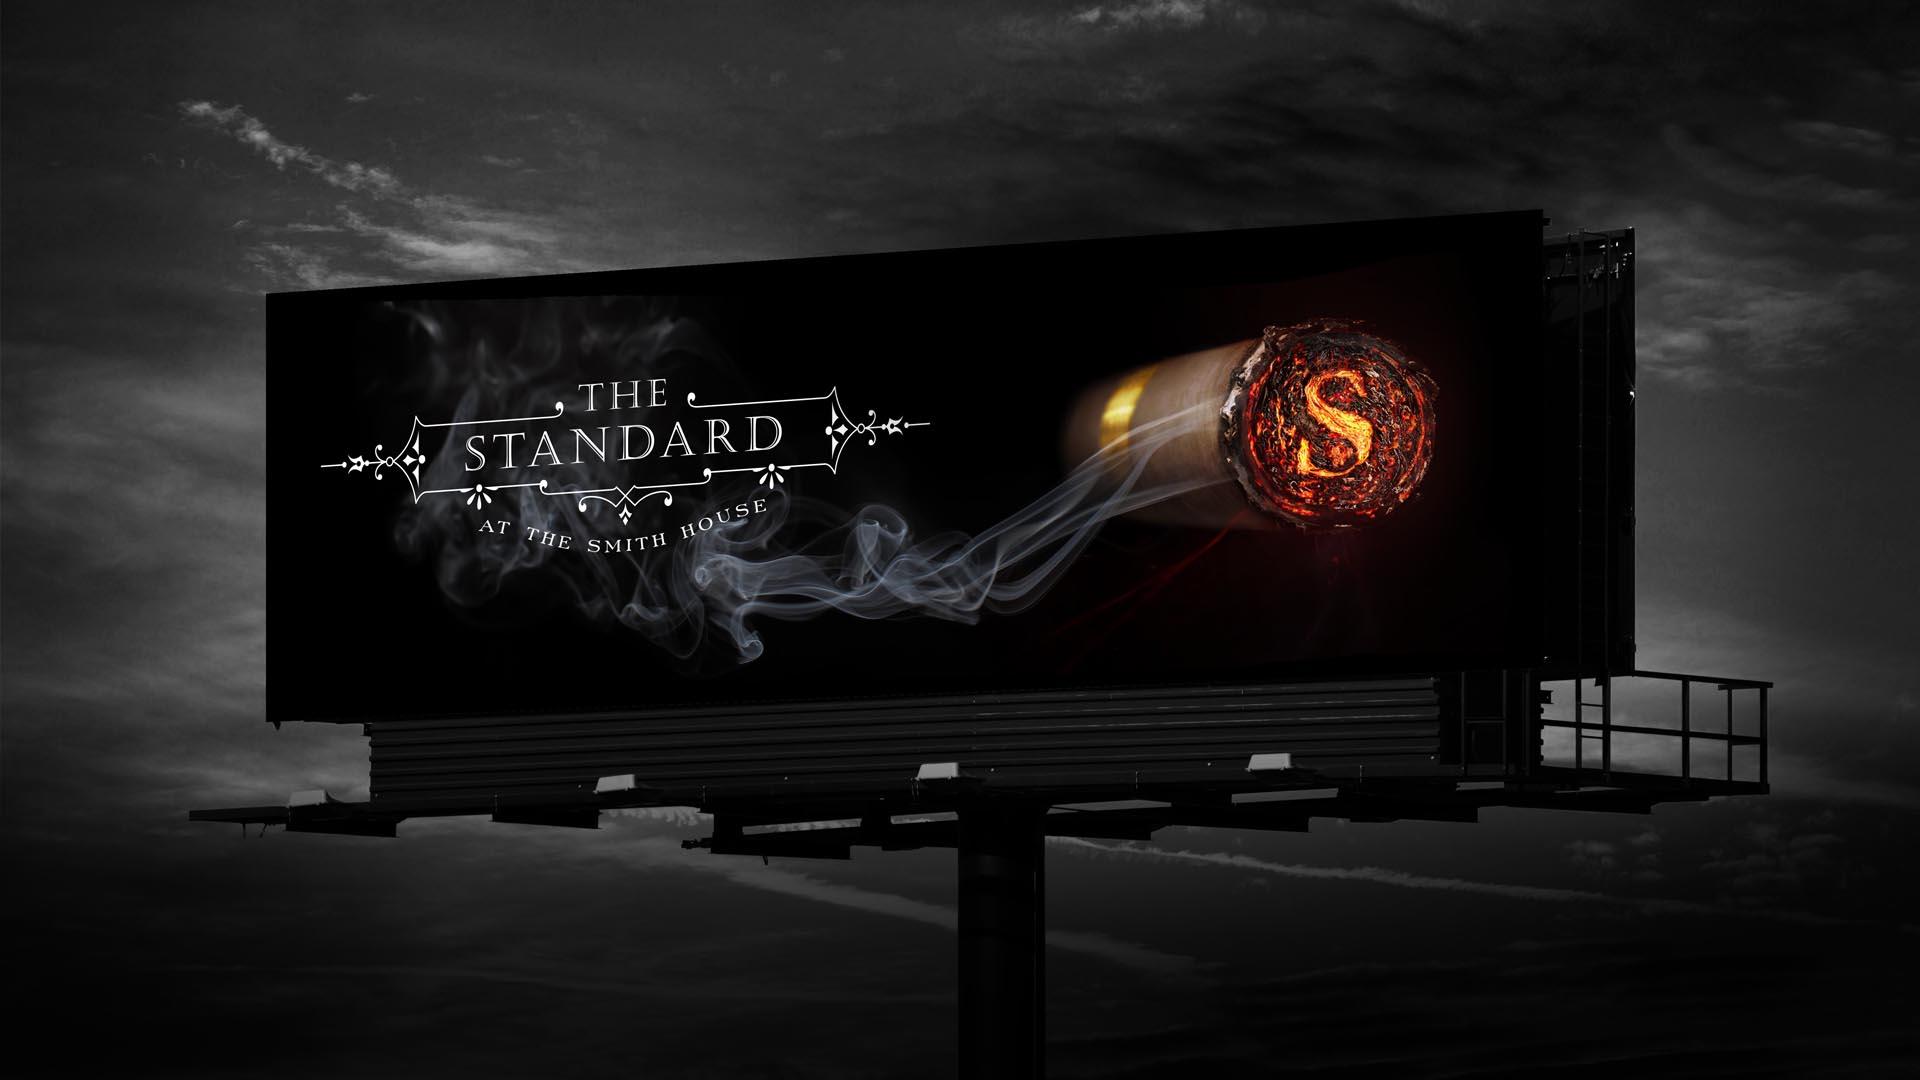 bohan | The Standard lit cigar billboard